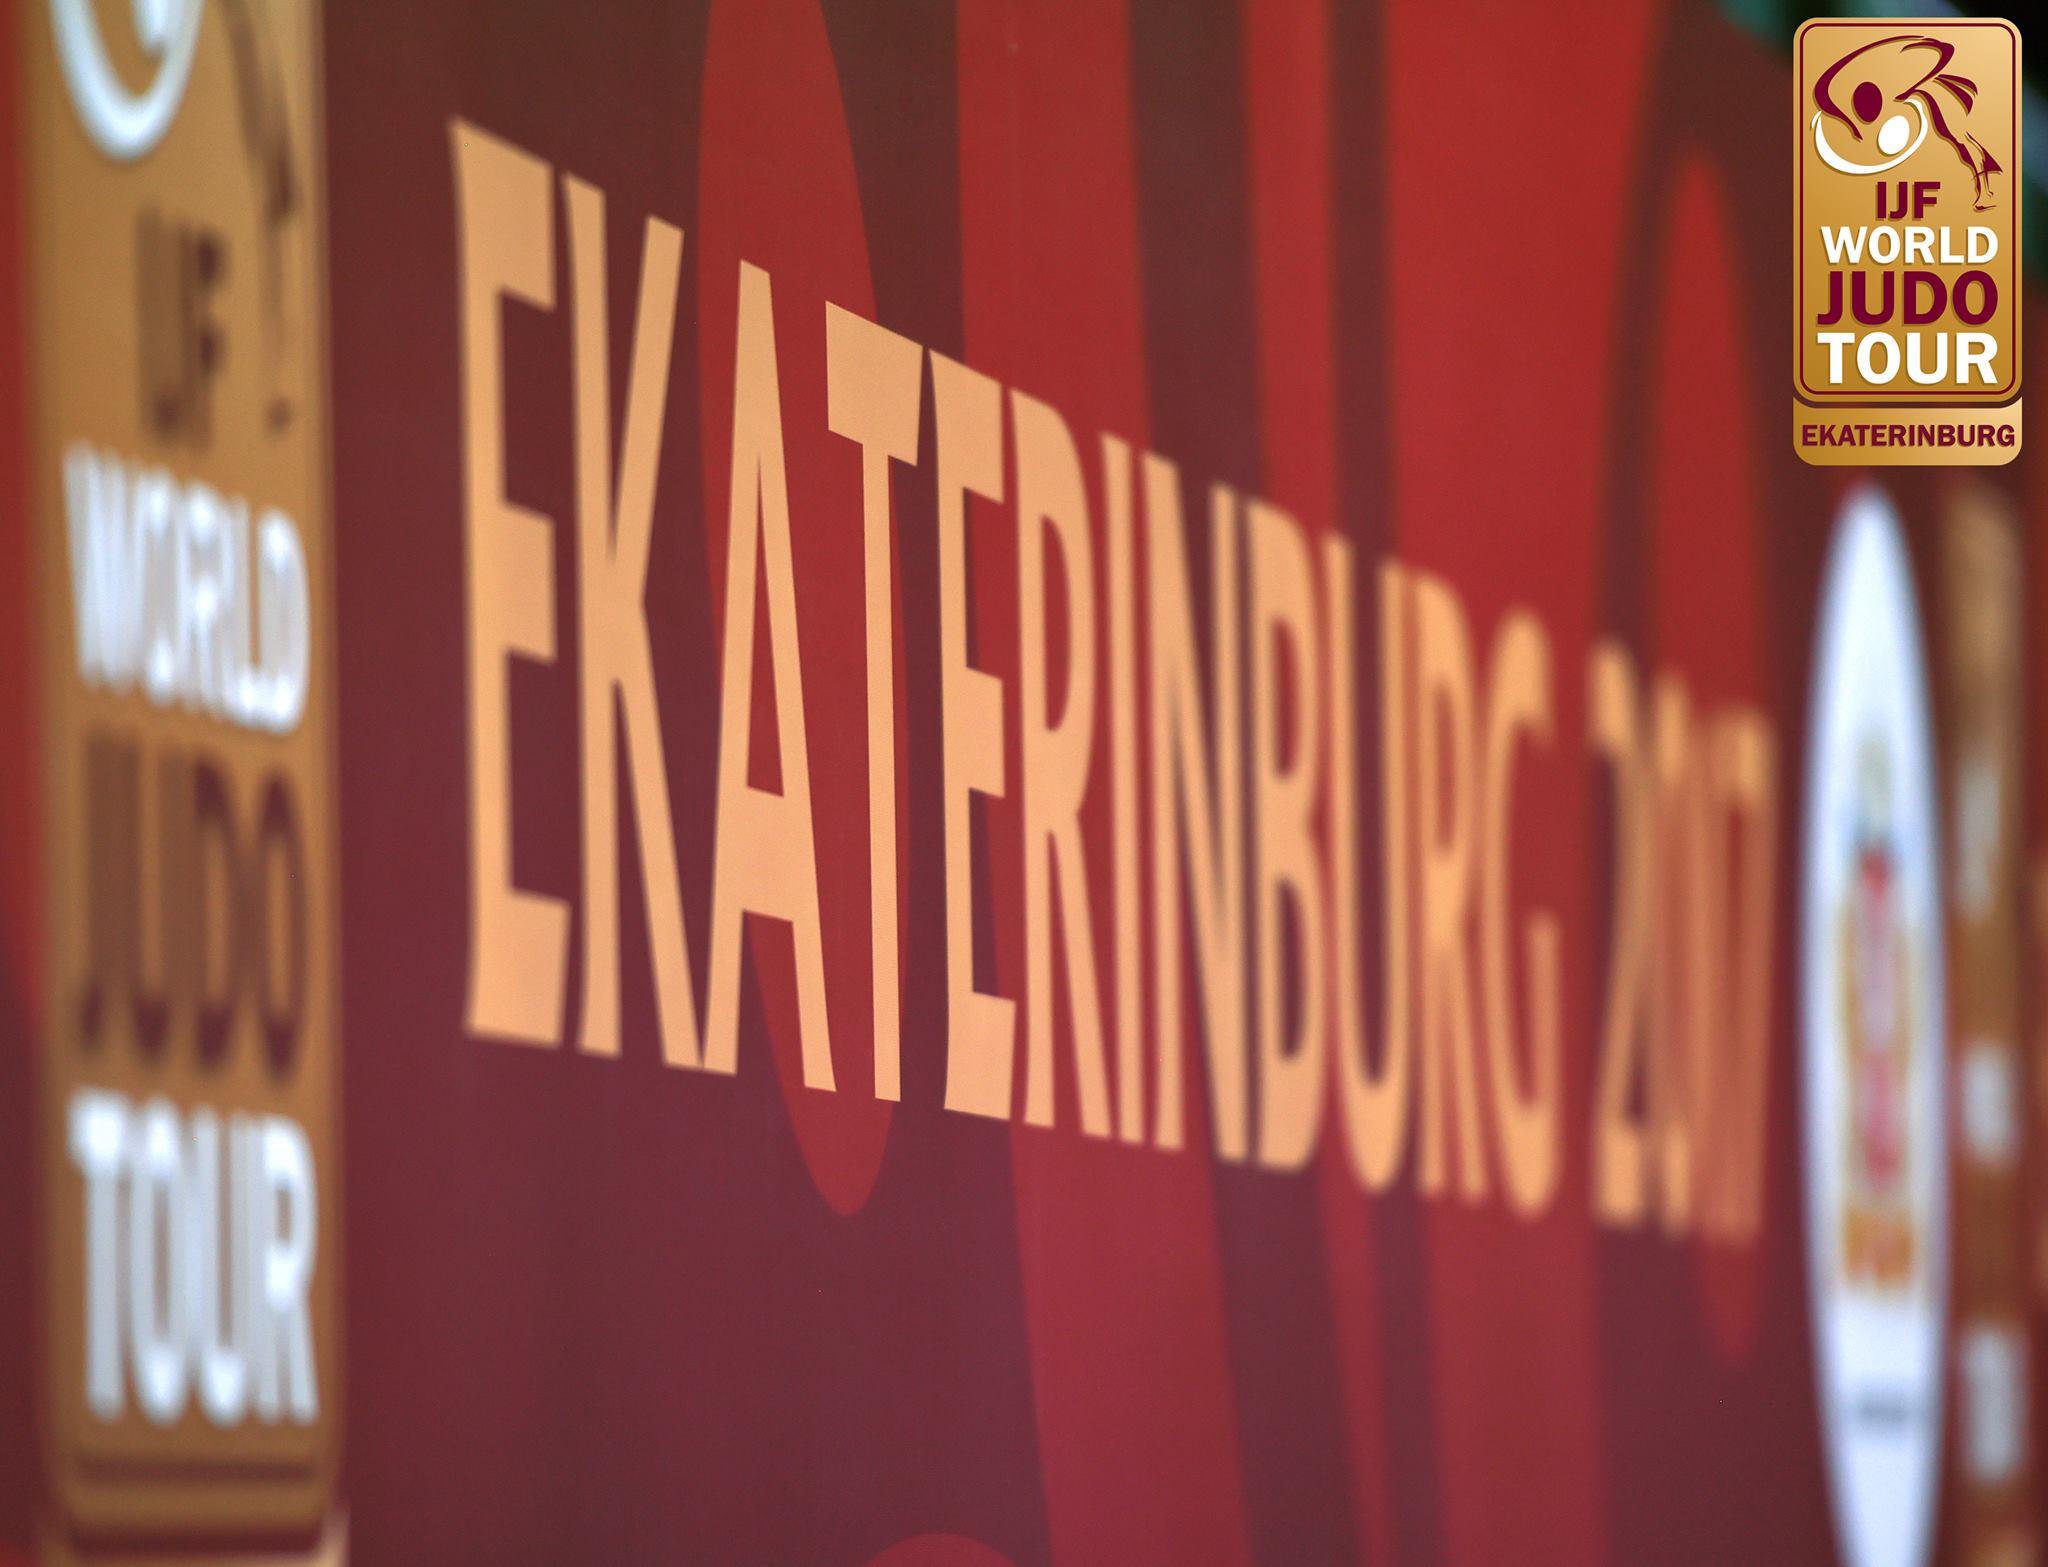 20170520_ekaterinburg_ijf_fb_2017_ekaterinburg